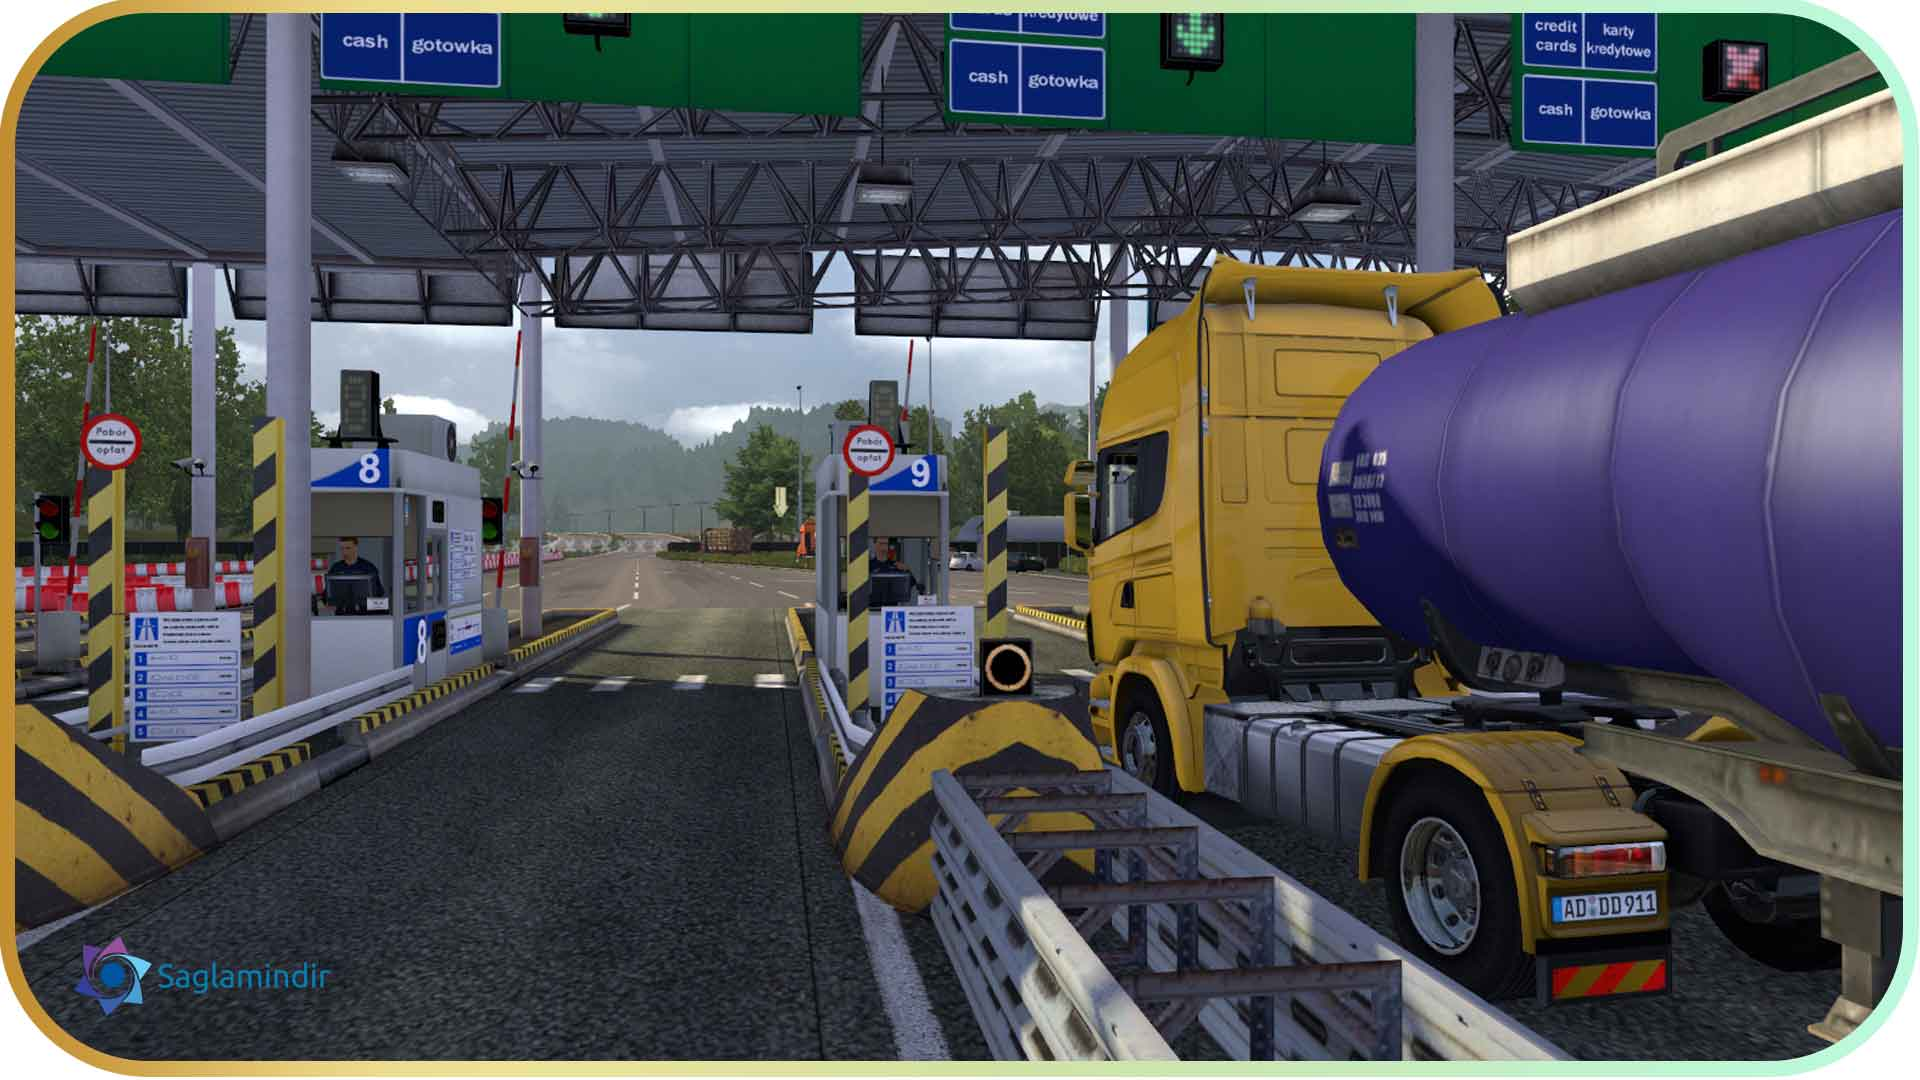 Truck & Trailers saglamindir